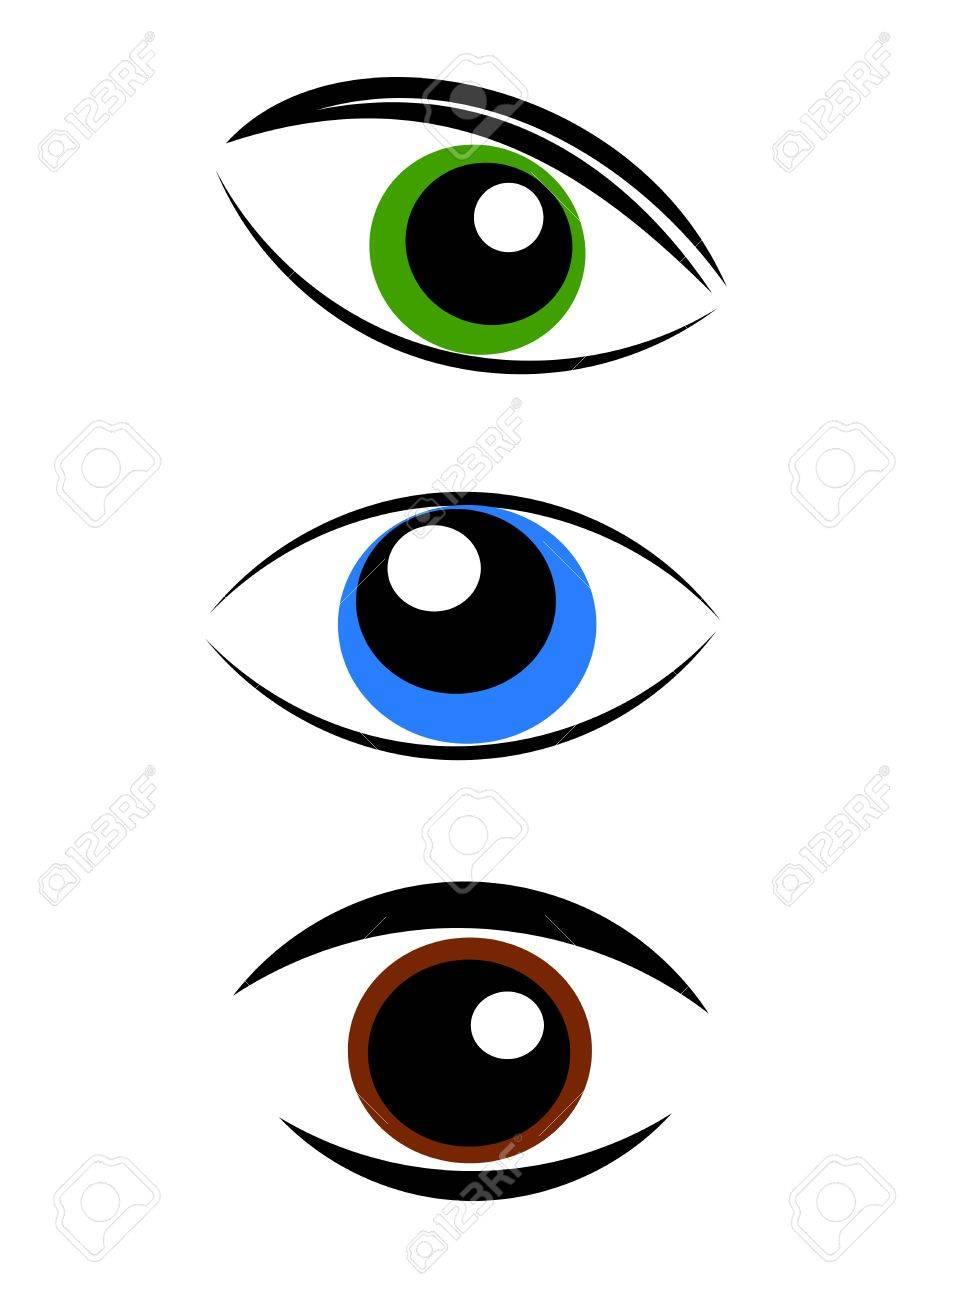 Eye symbols - vector illustration Stock Vector - 9686371